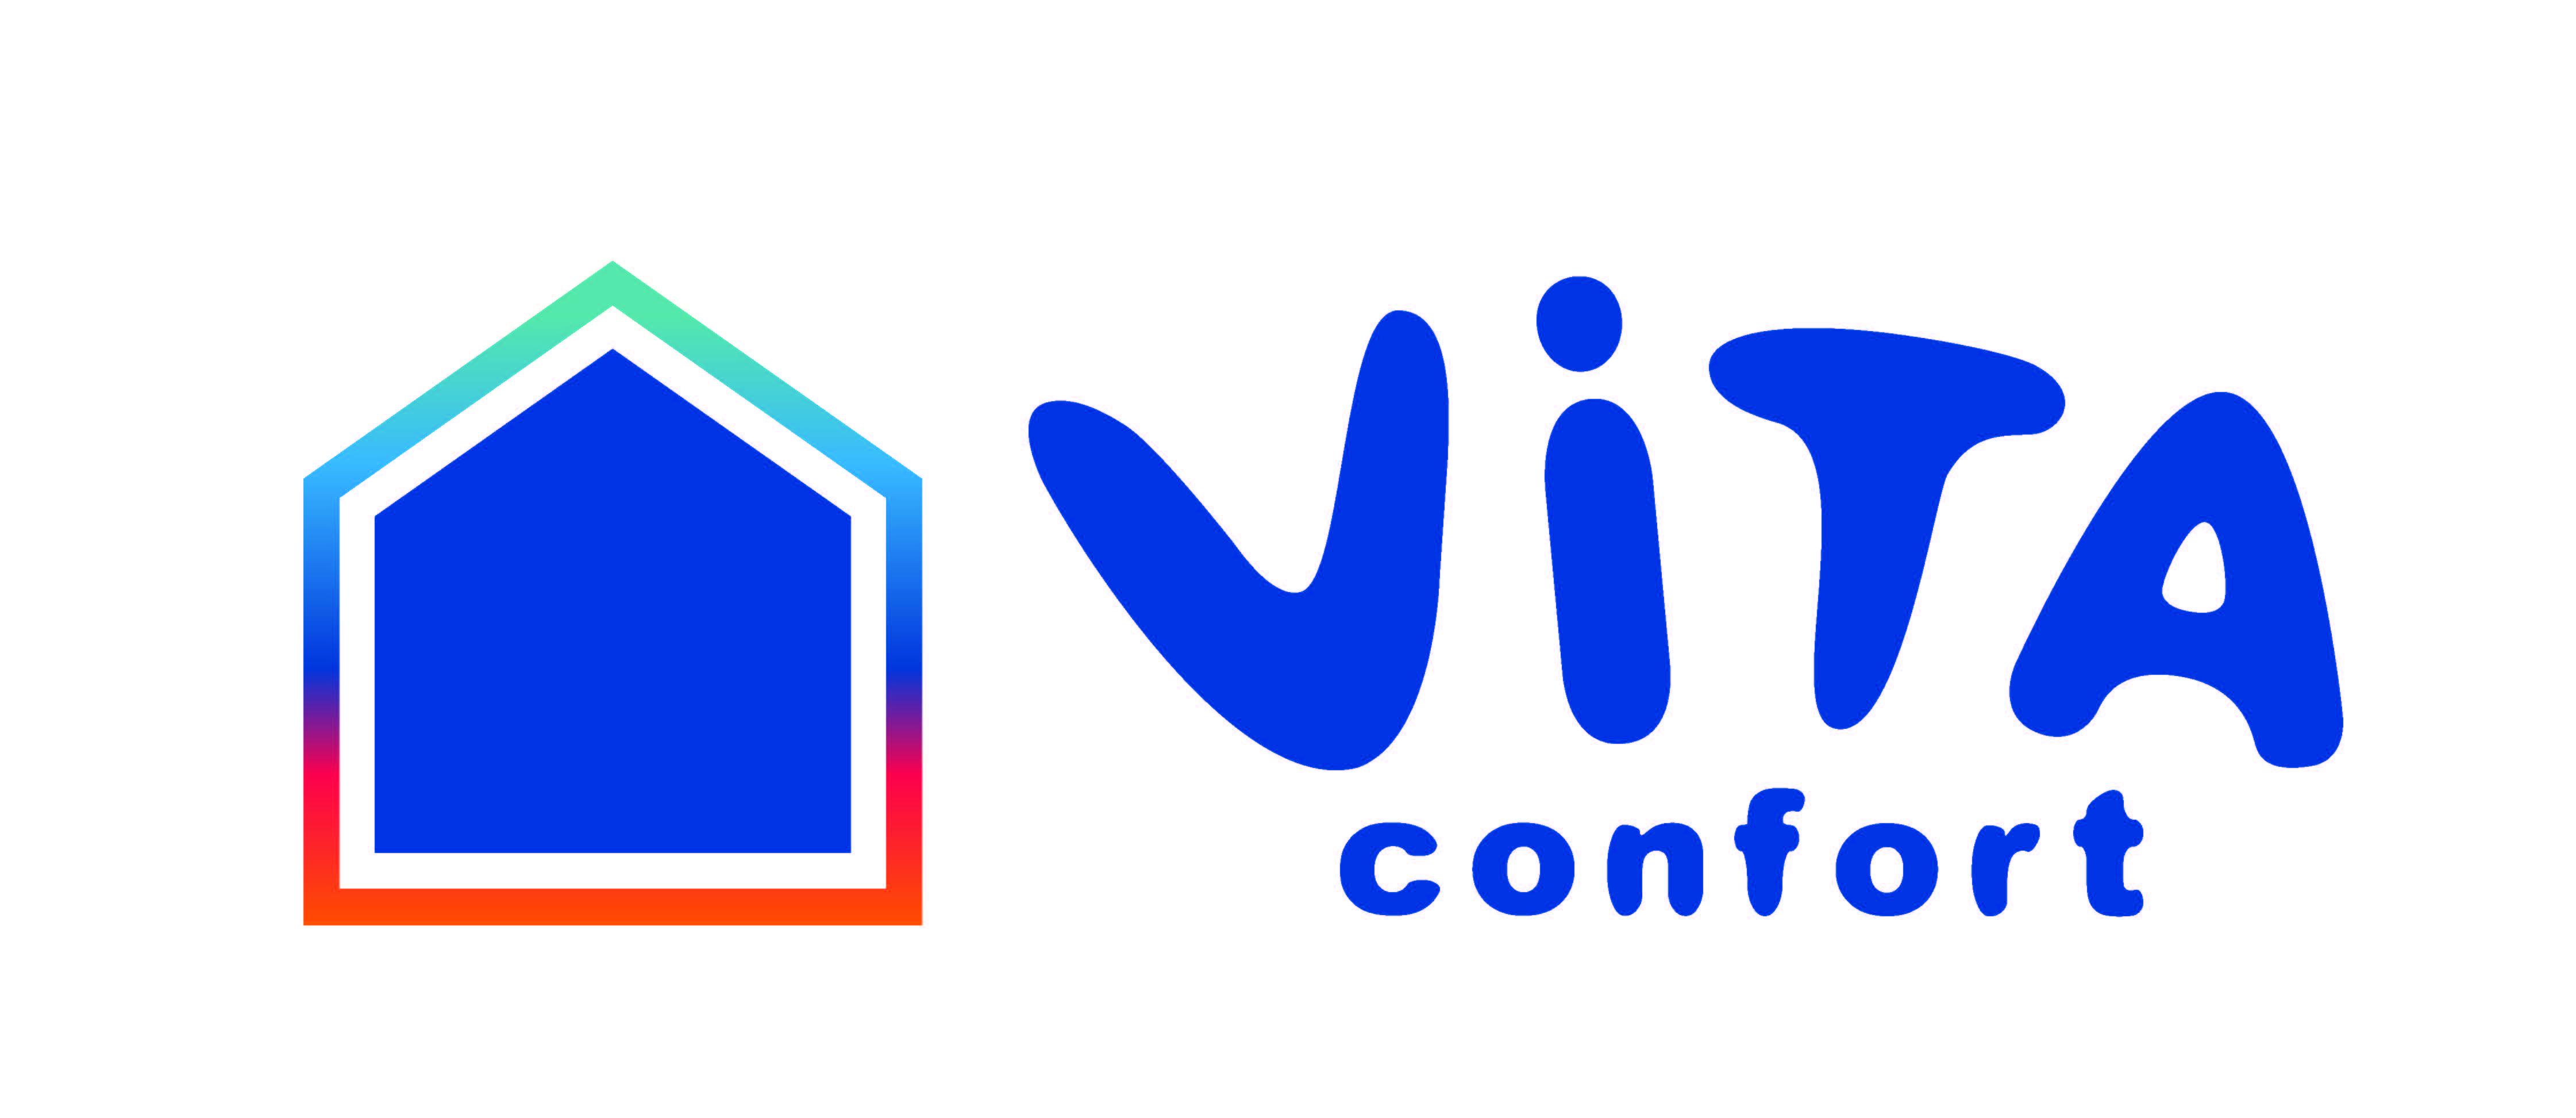 Vita Confort 25 Rue Lecourbe vitaconfort la salle de bain adaptée - le magazine du